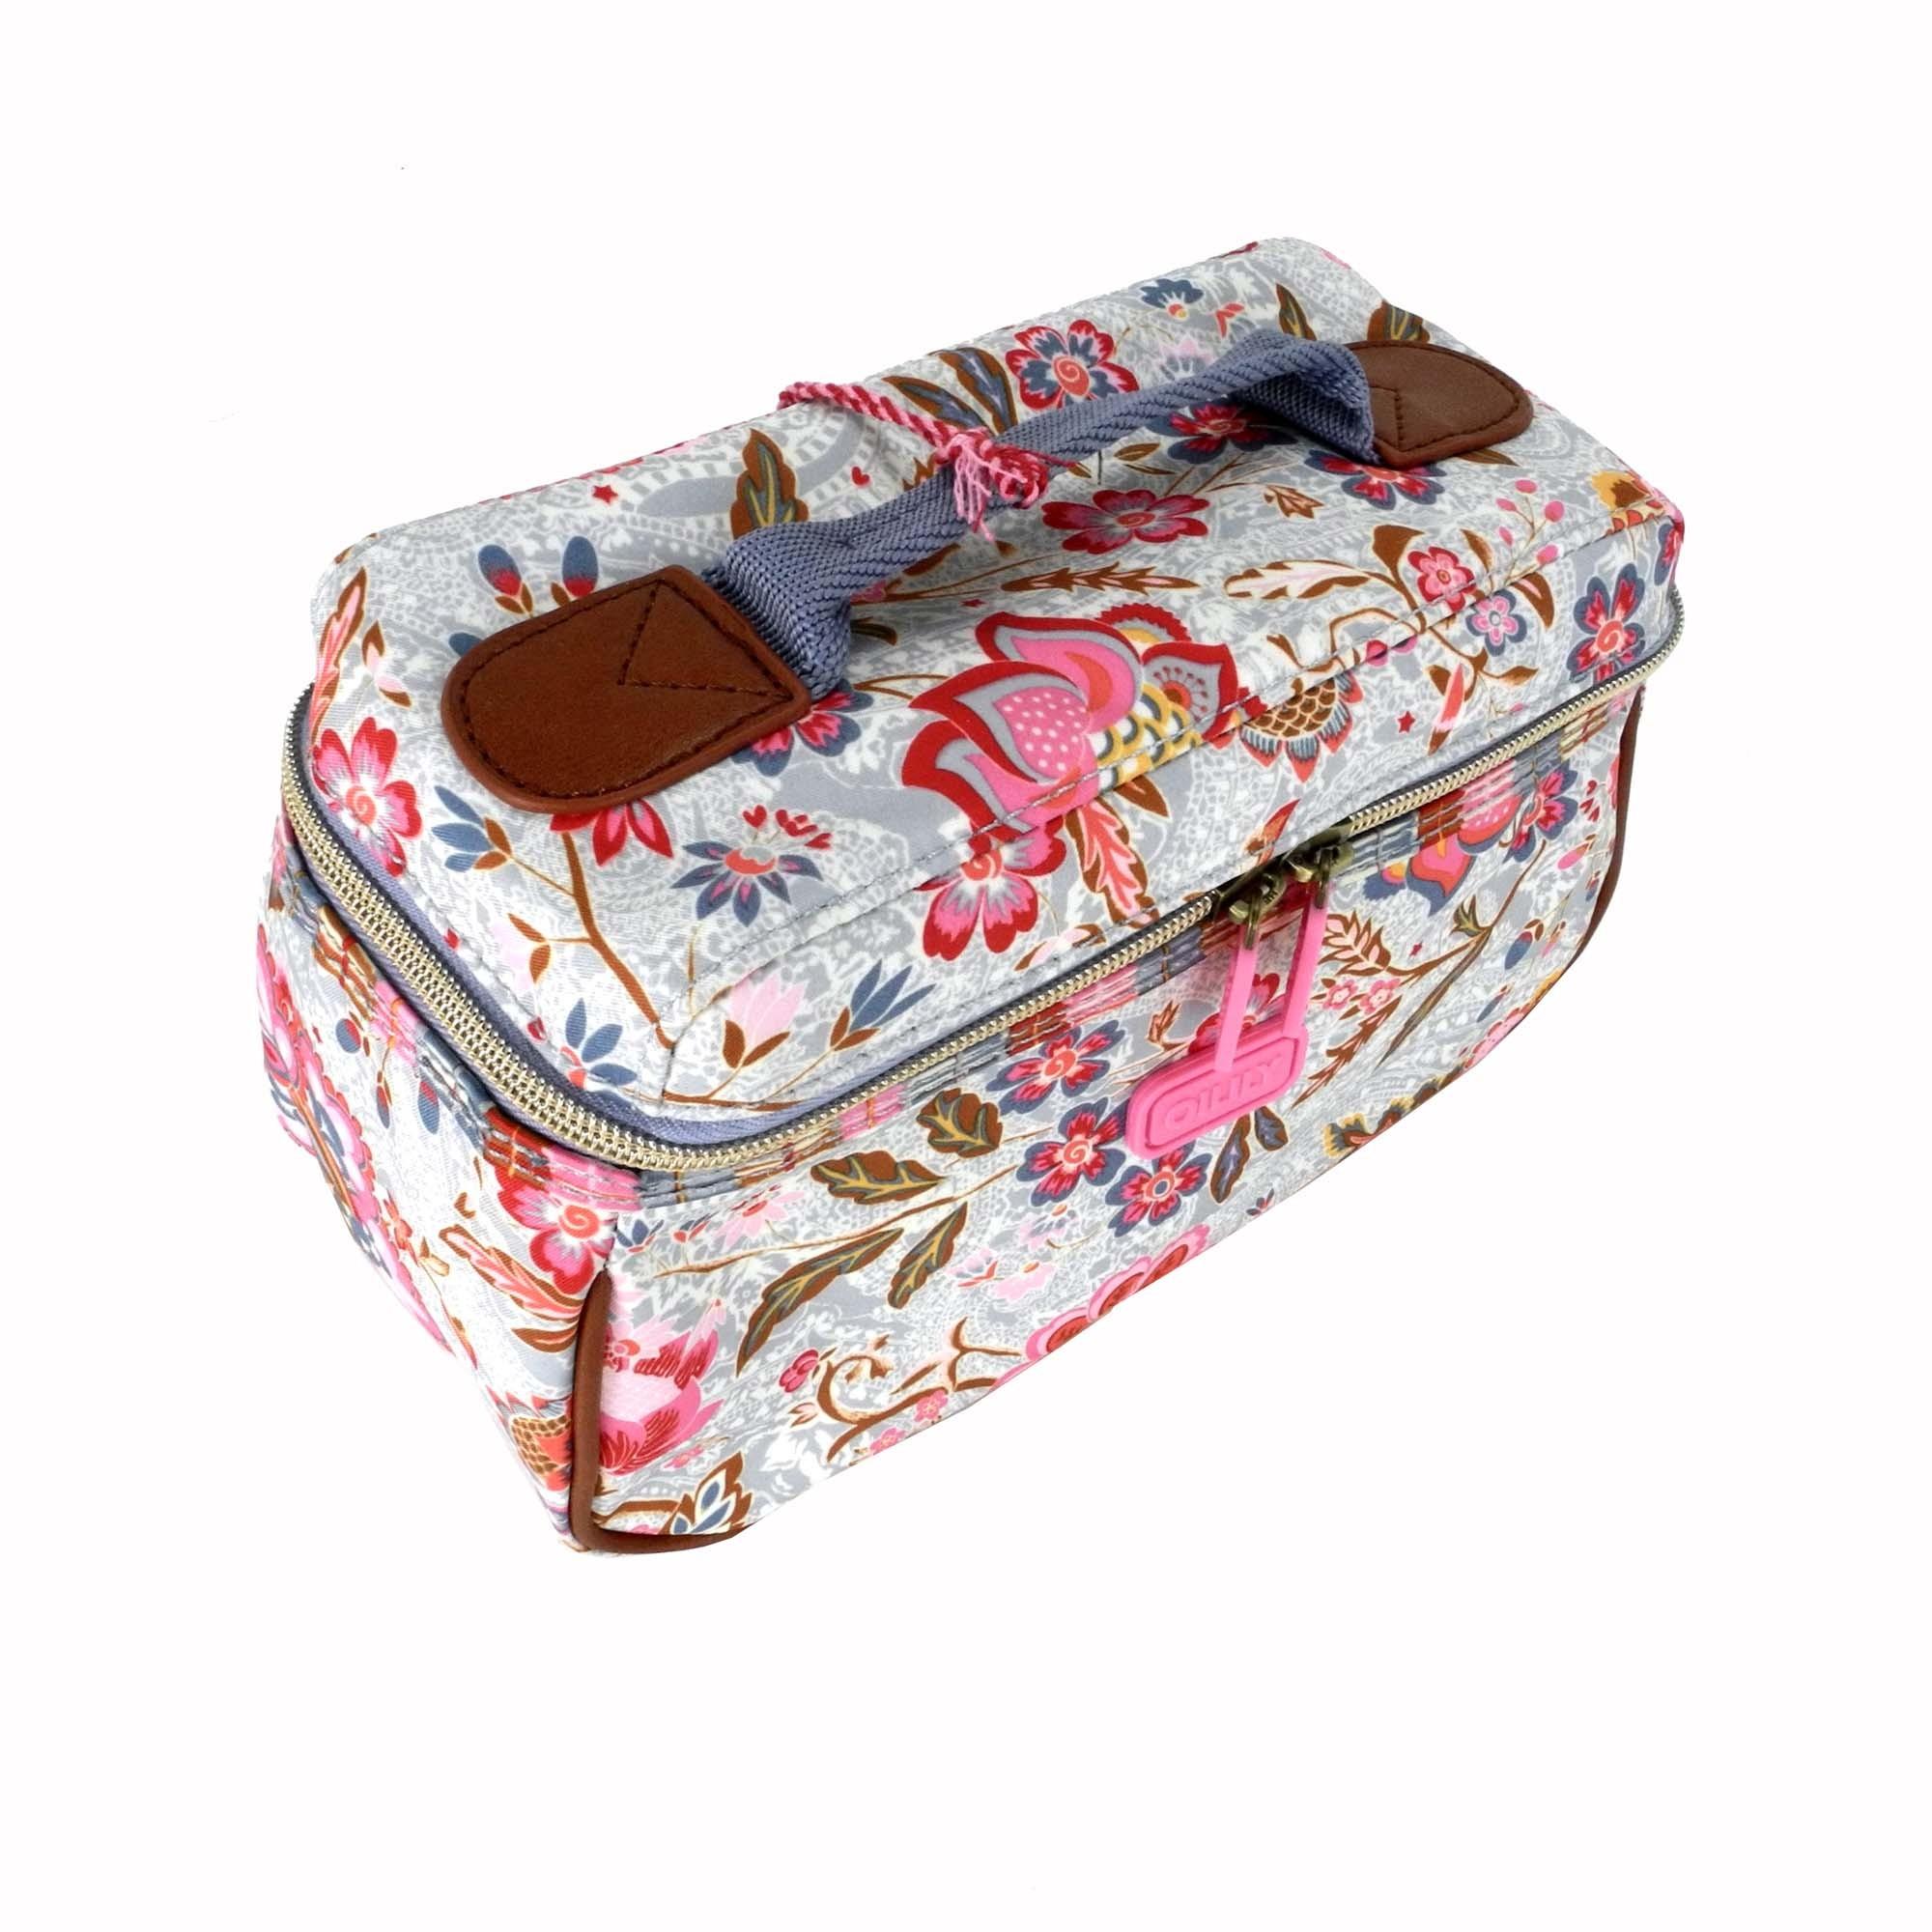 oilily kosmetiktasche m beauty case summer blossom sky hellblau ebay. Black Bedroom Furniture Sets. Home Design Ideas